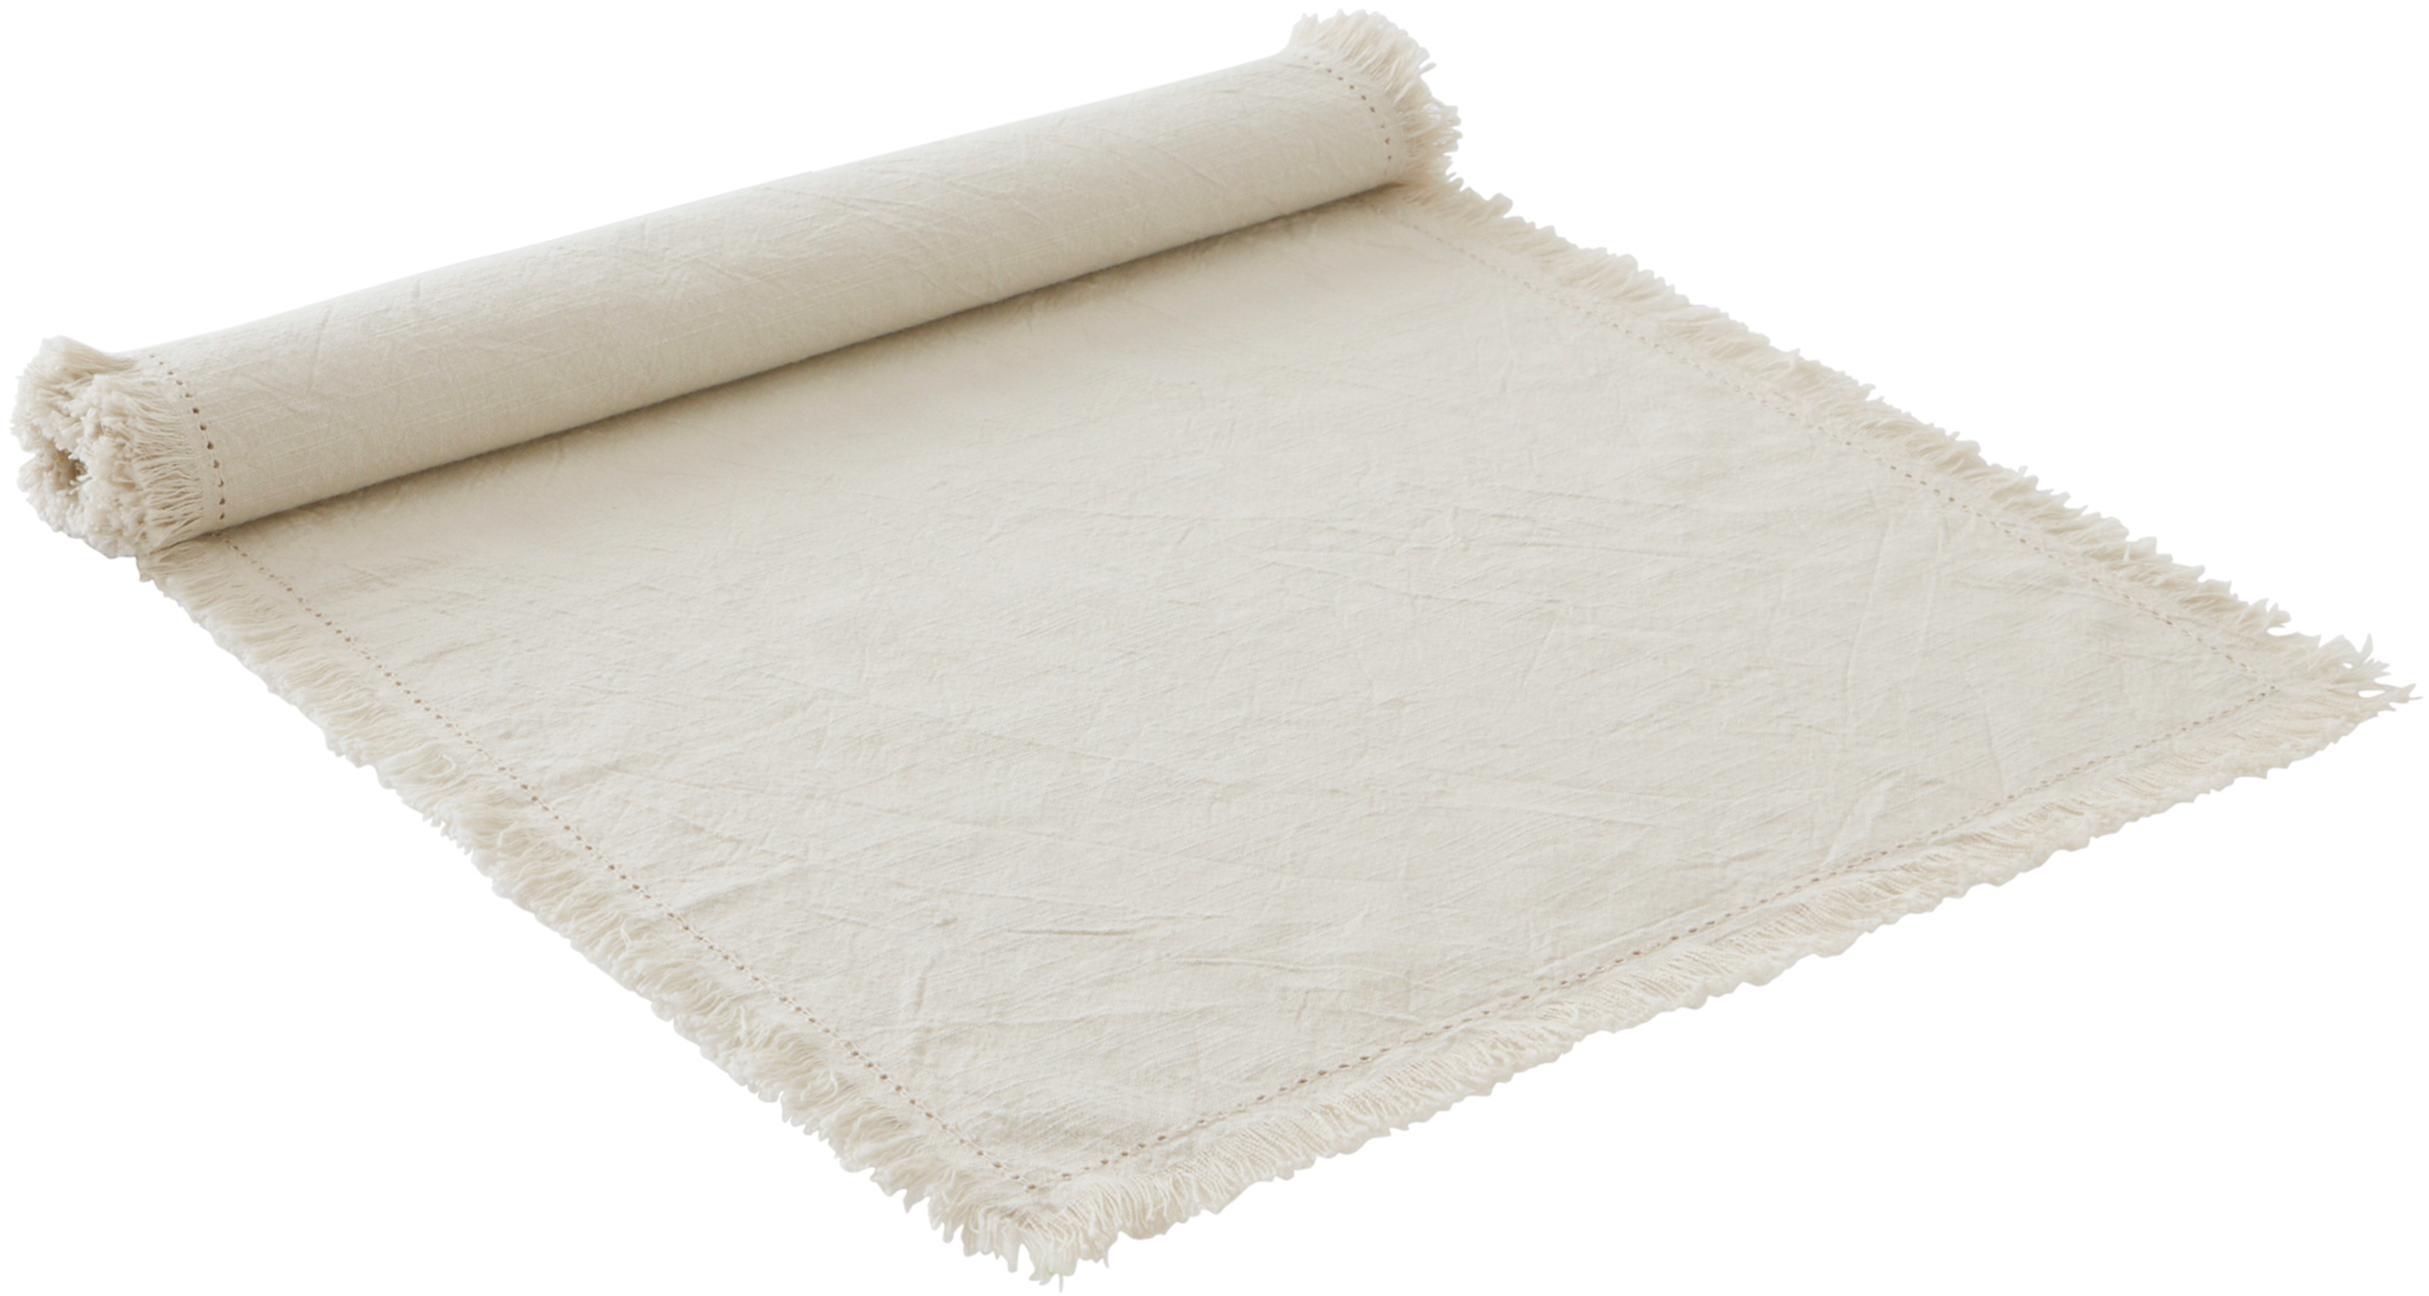 Camino de mesa Hilma, 100%algodón, Gris pardo, An 40 x L 140 cm